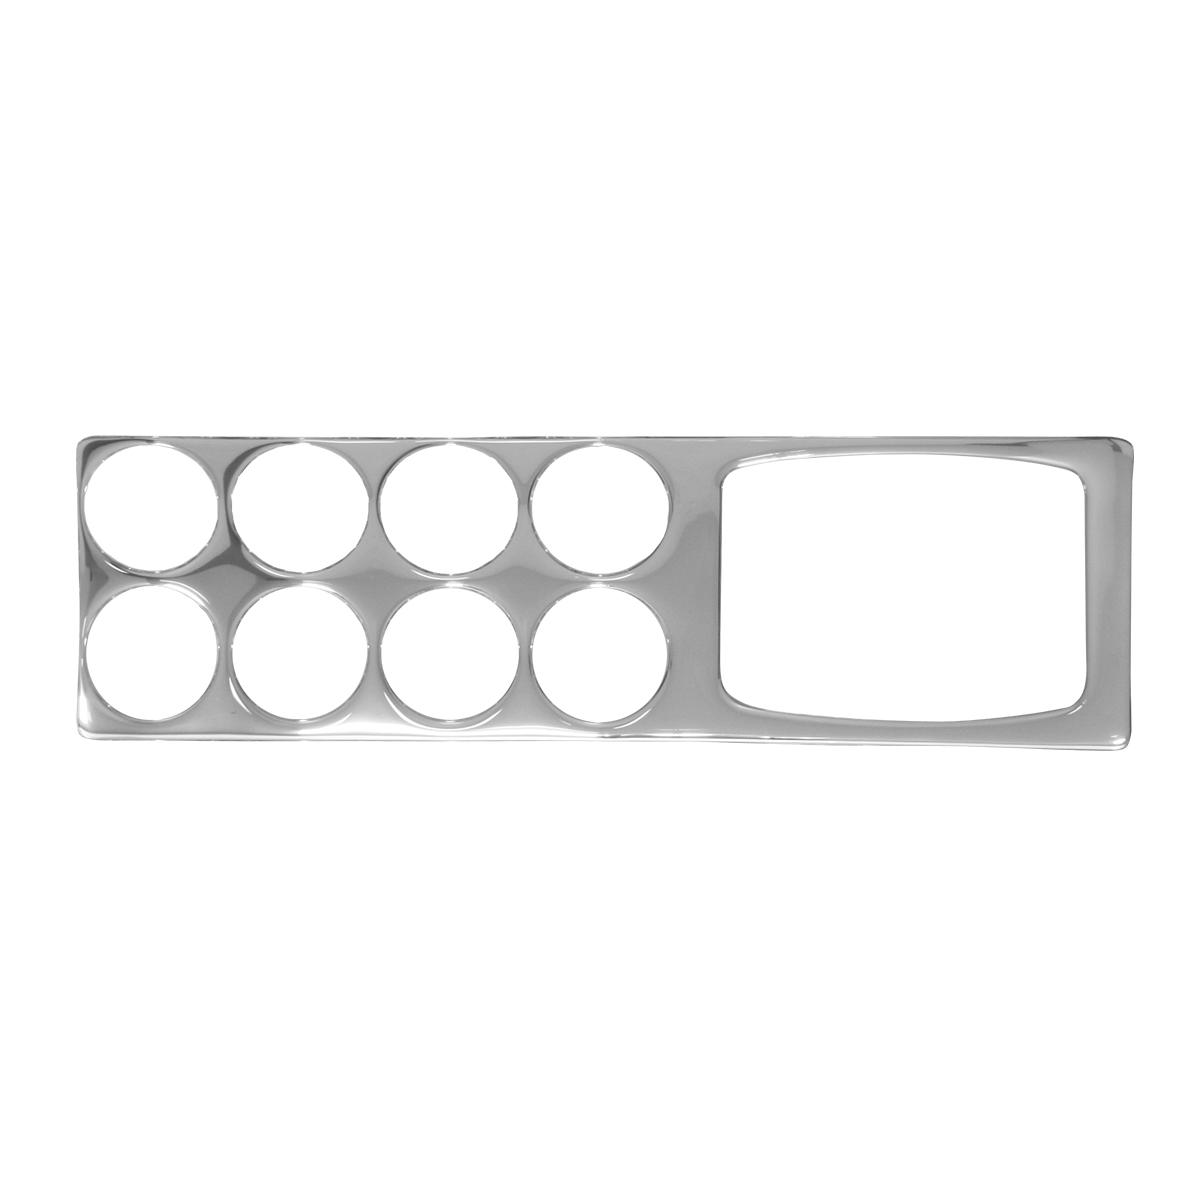 66941 KW Chrome Soft Plastic Gauge Trim with Navigation